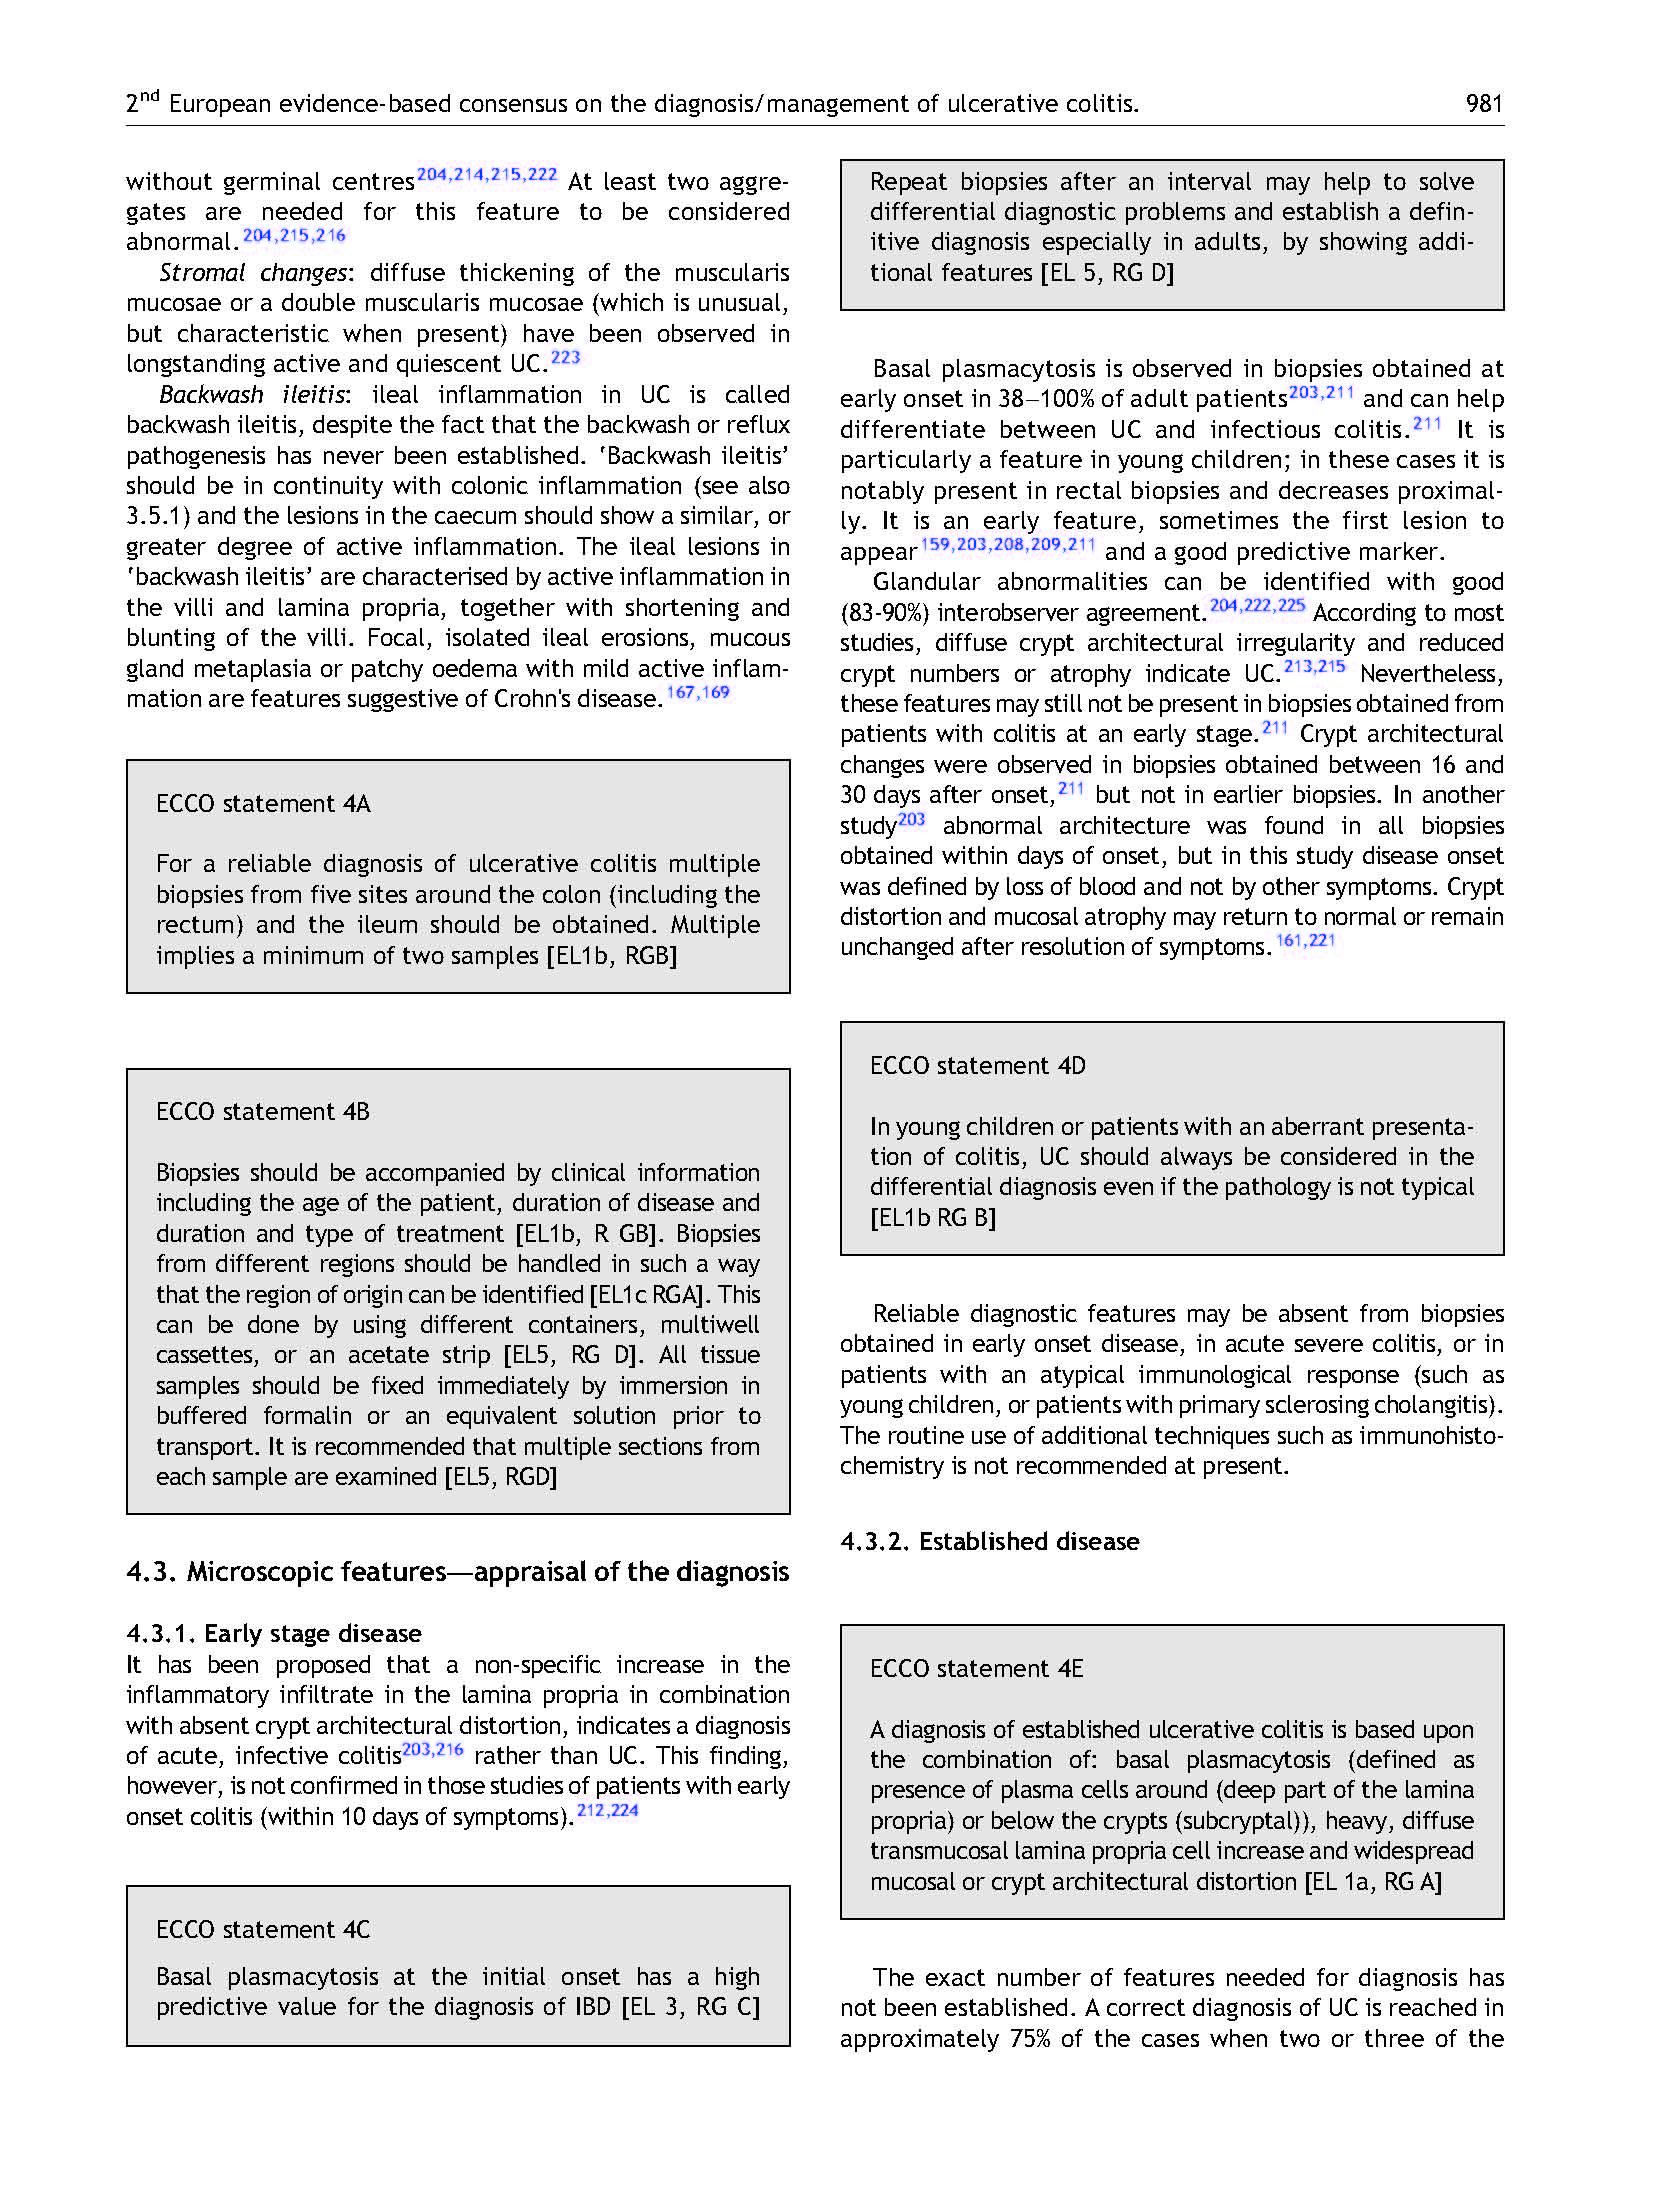 2012-ECCO第二版-欧洲询证共识:溃疡性结肠炎的诊断和处理—定义与诊断_页面_17.jpg